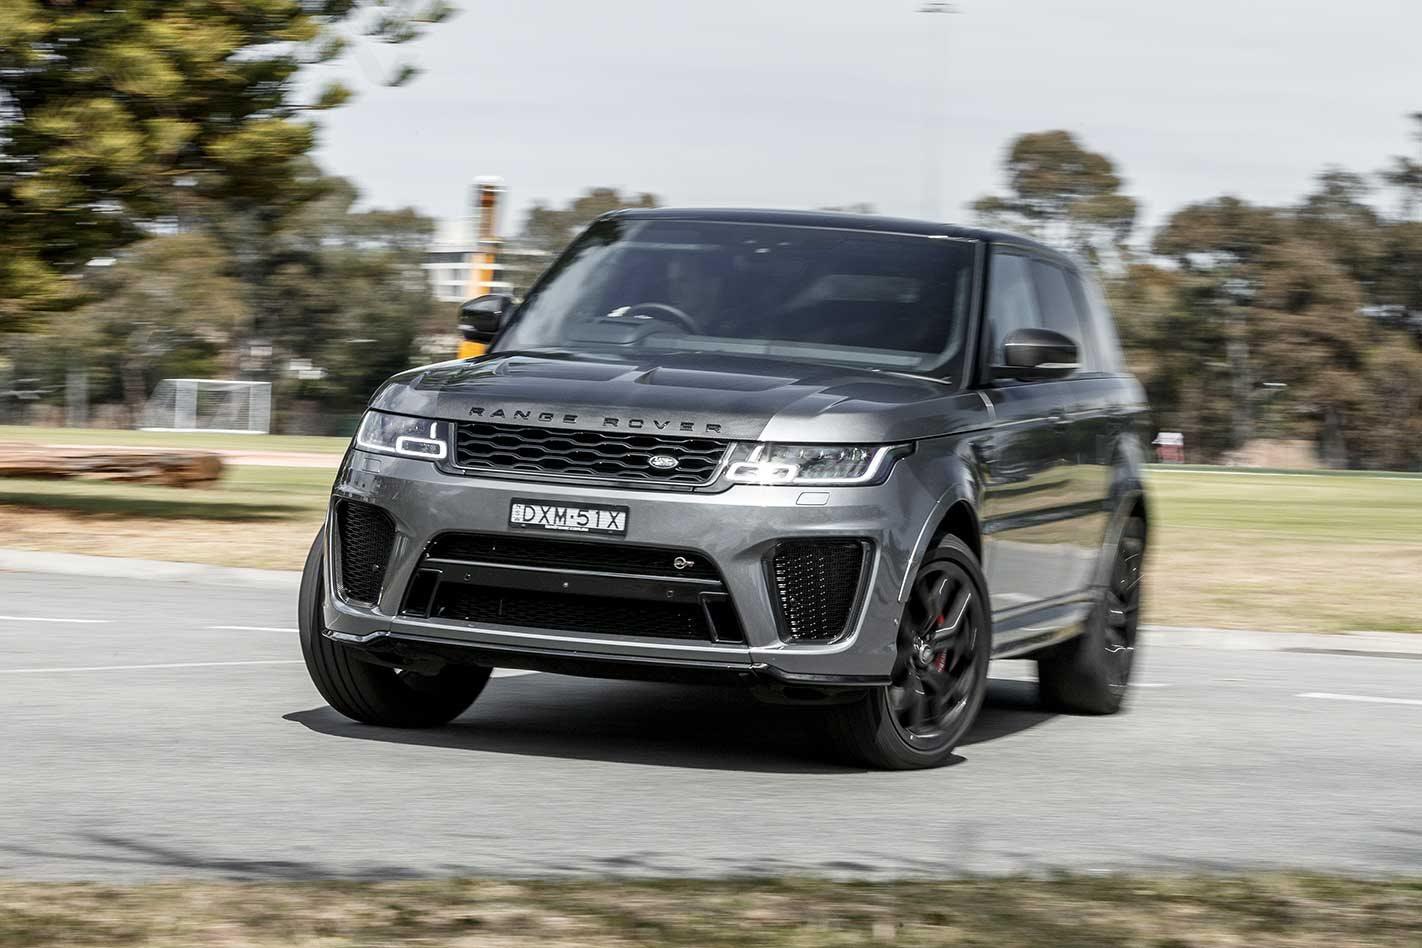 2019 Range Rover Sport SVR performance review